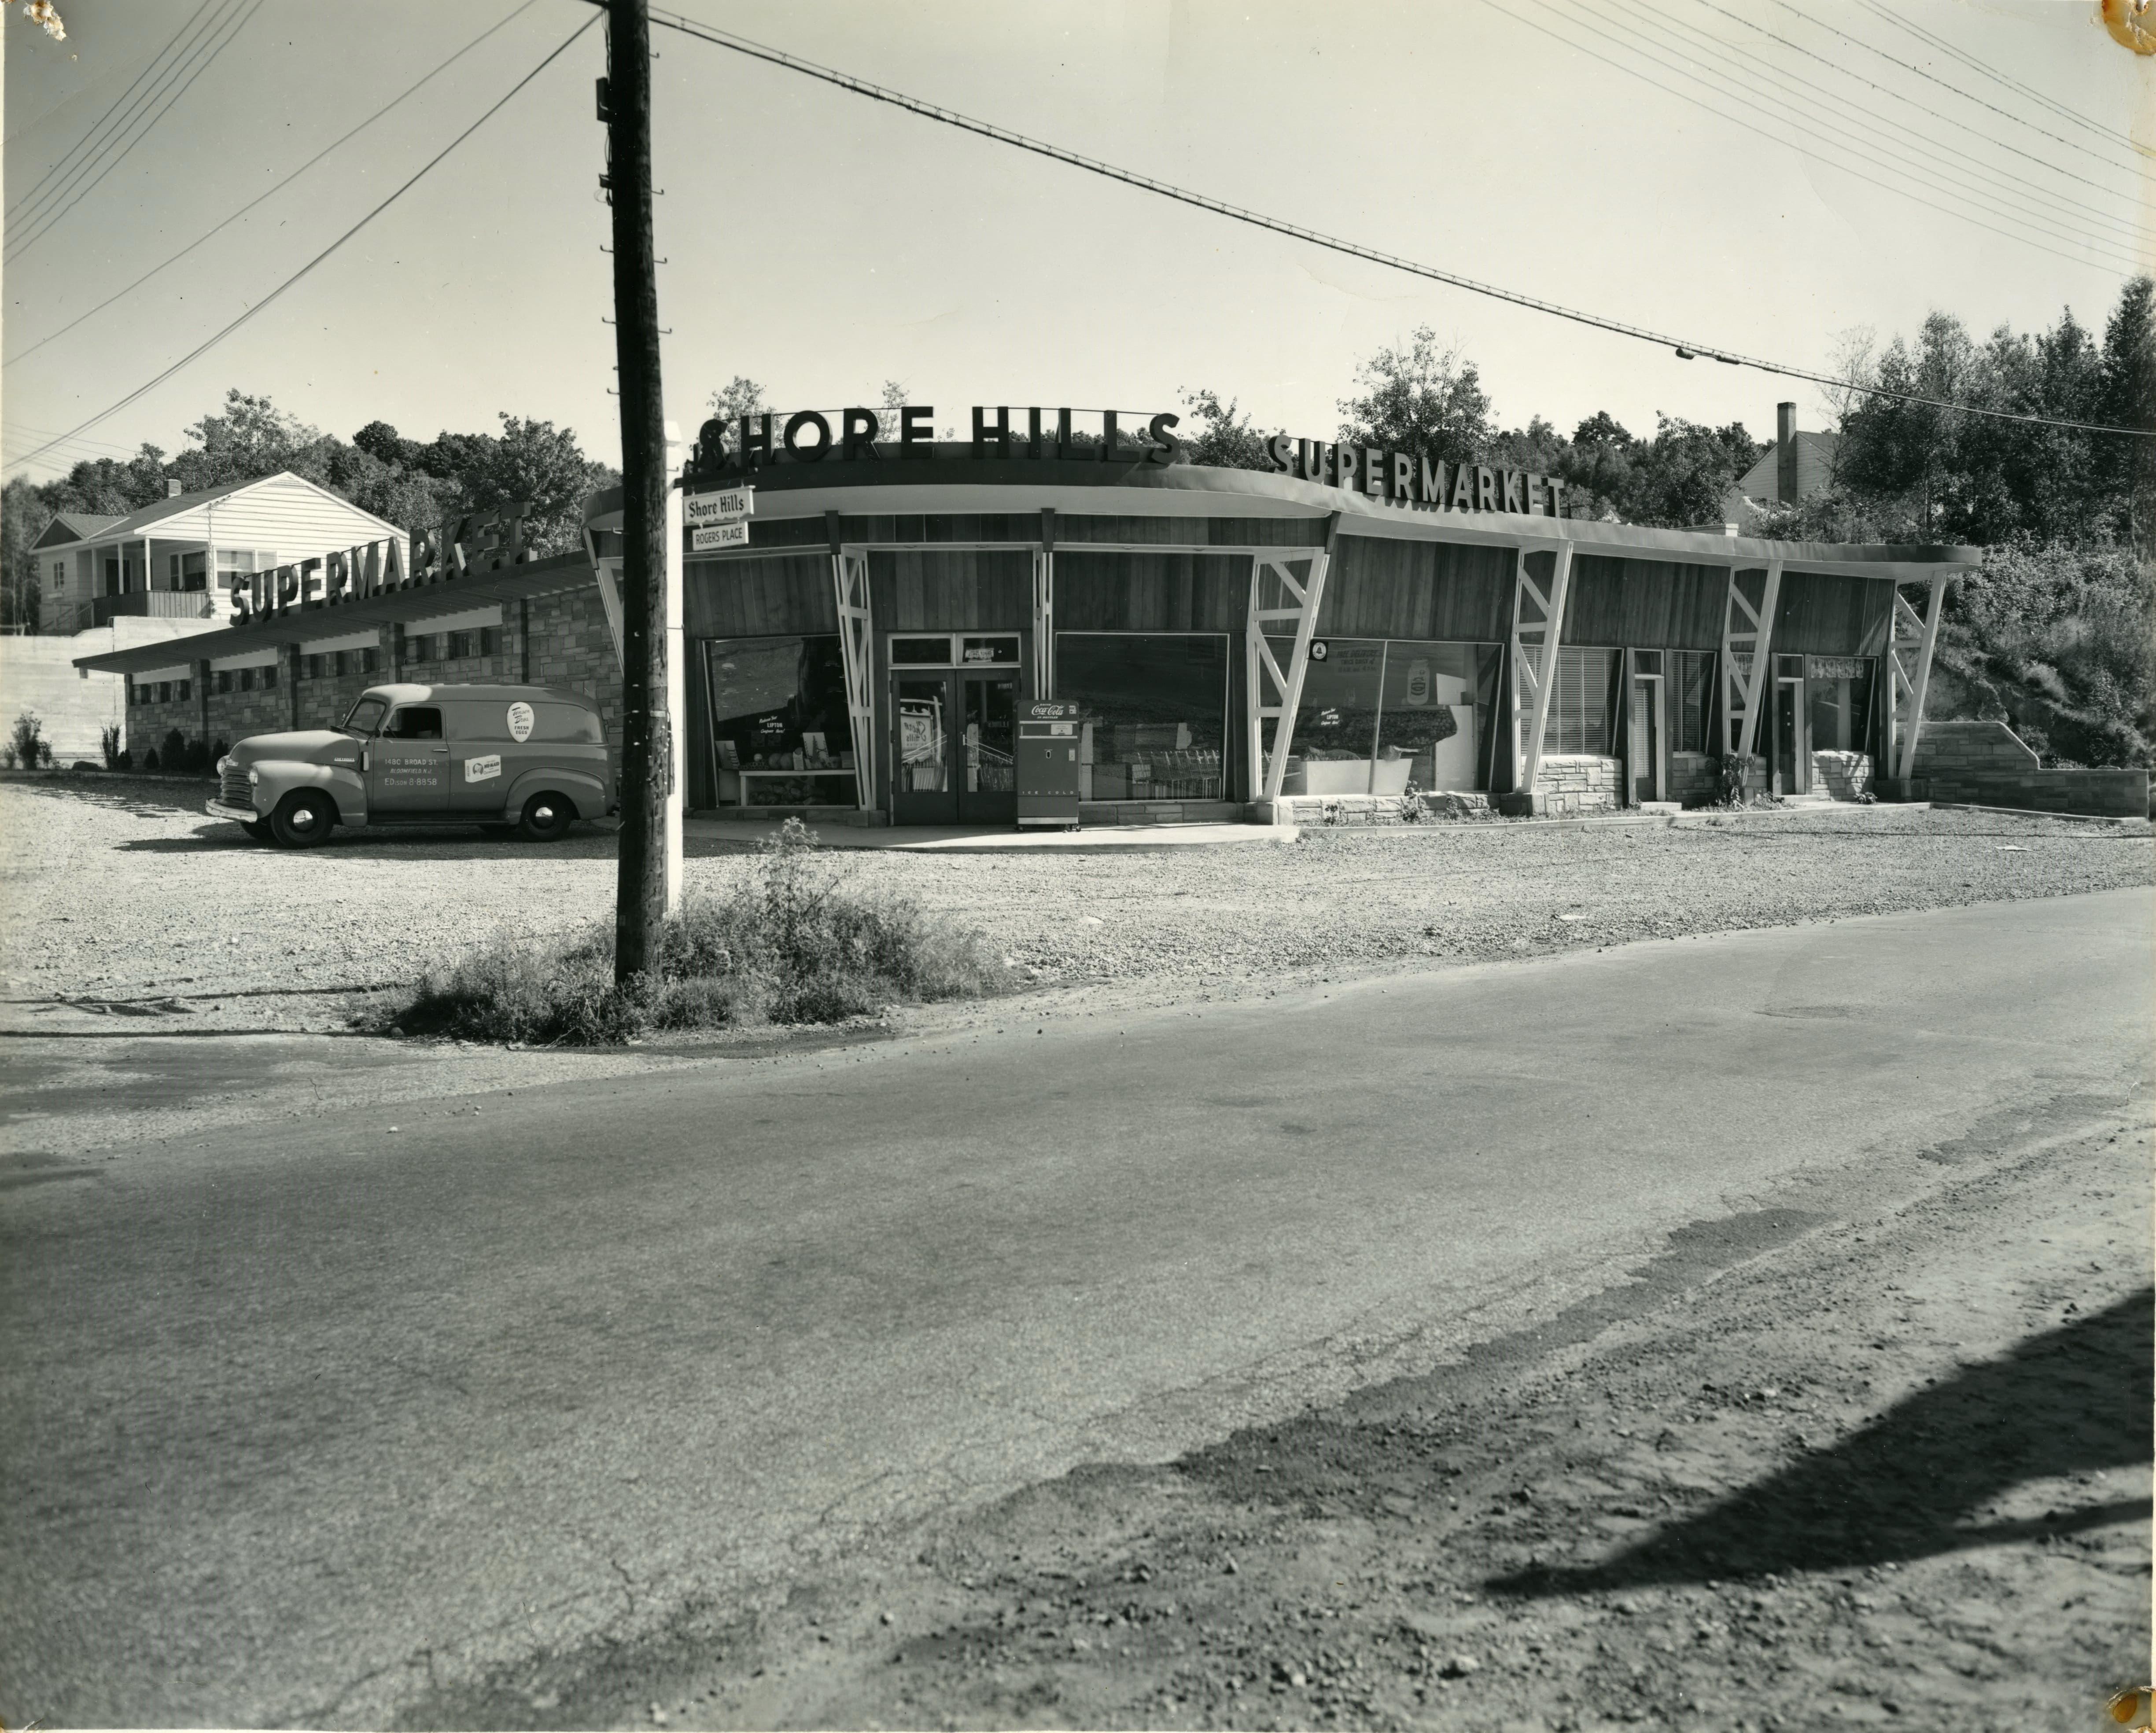 The original Shore Hills Grocery